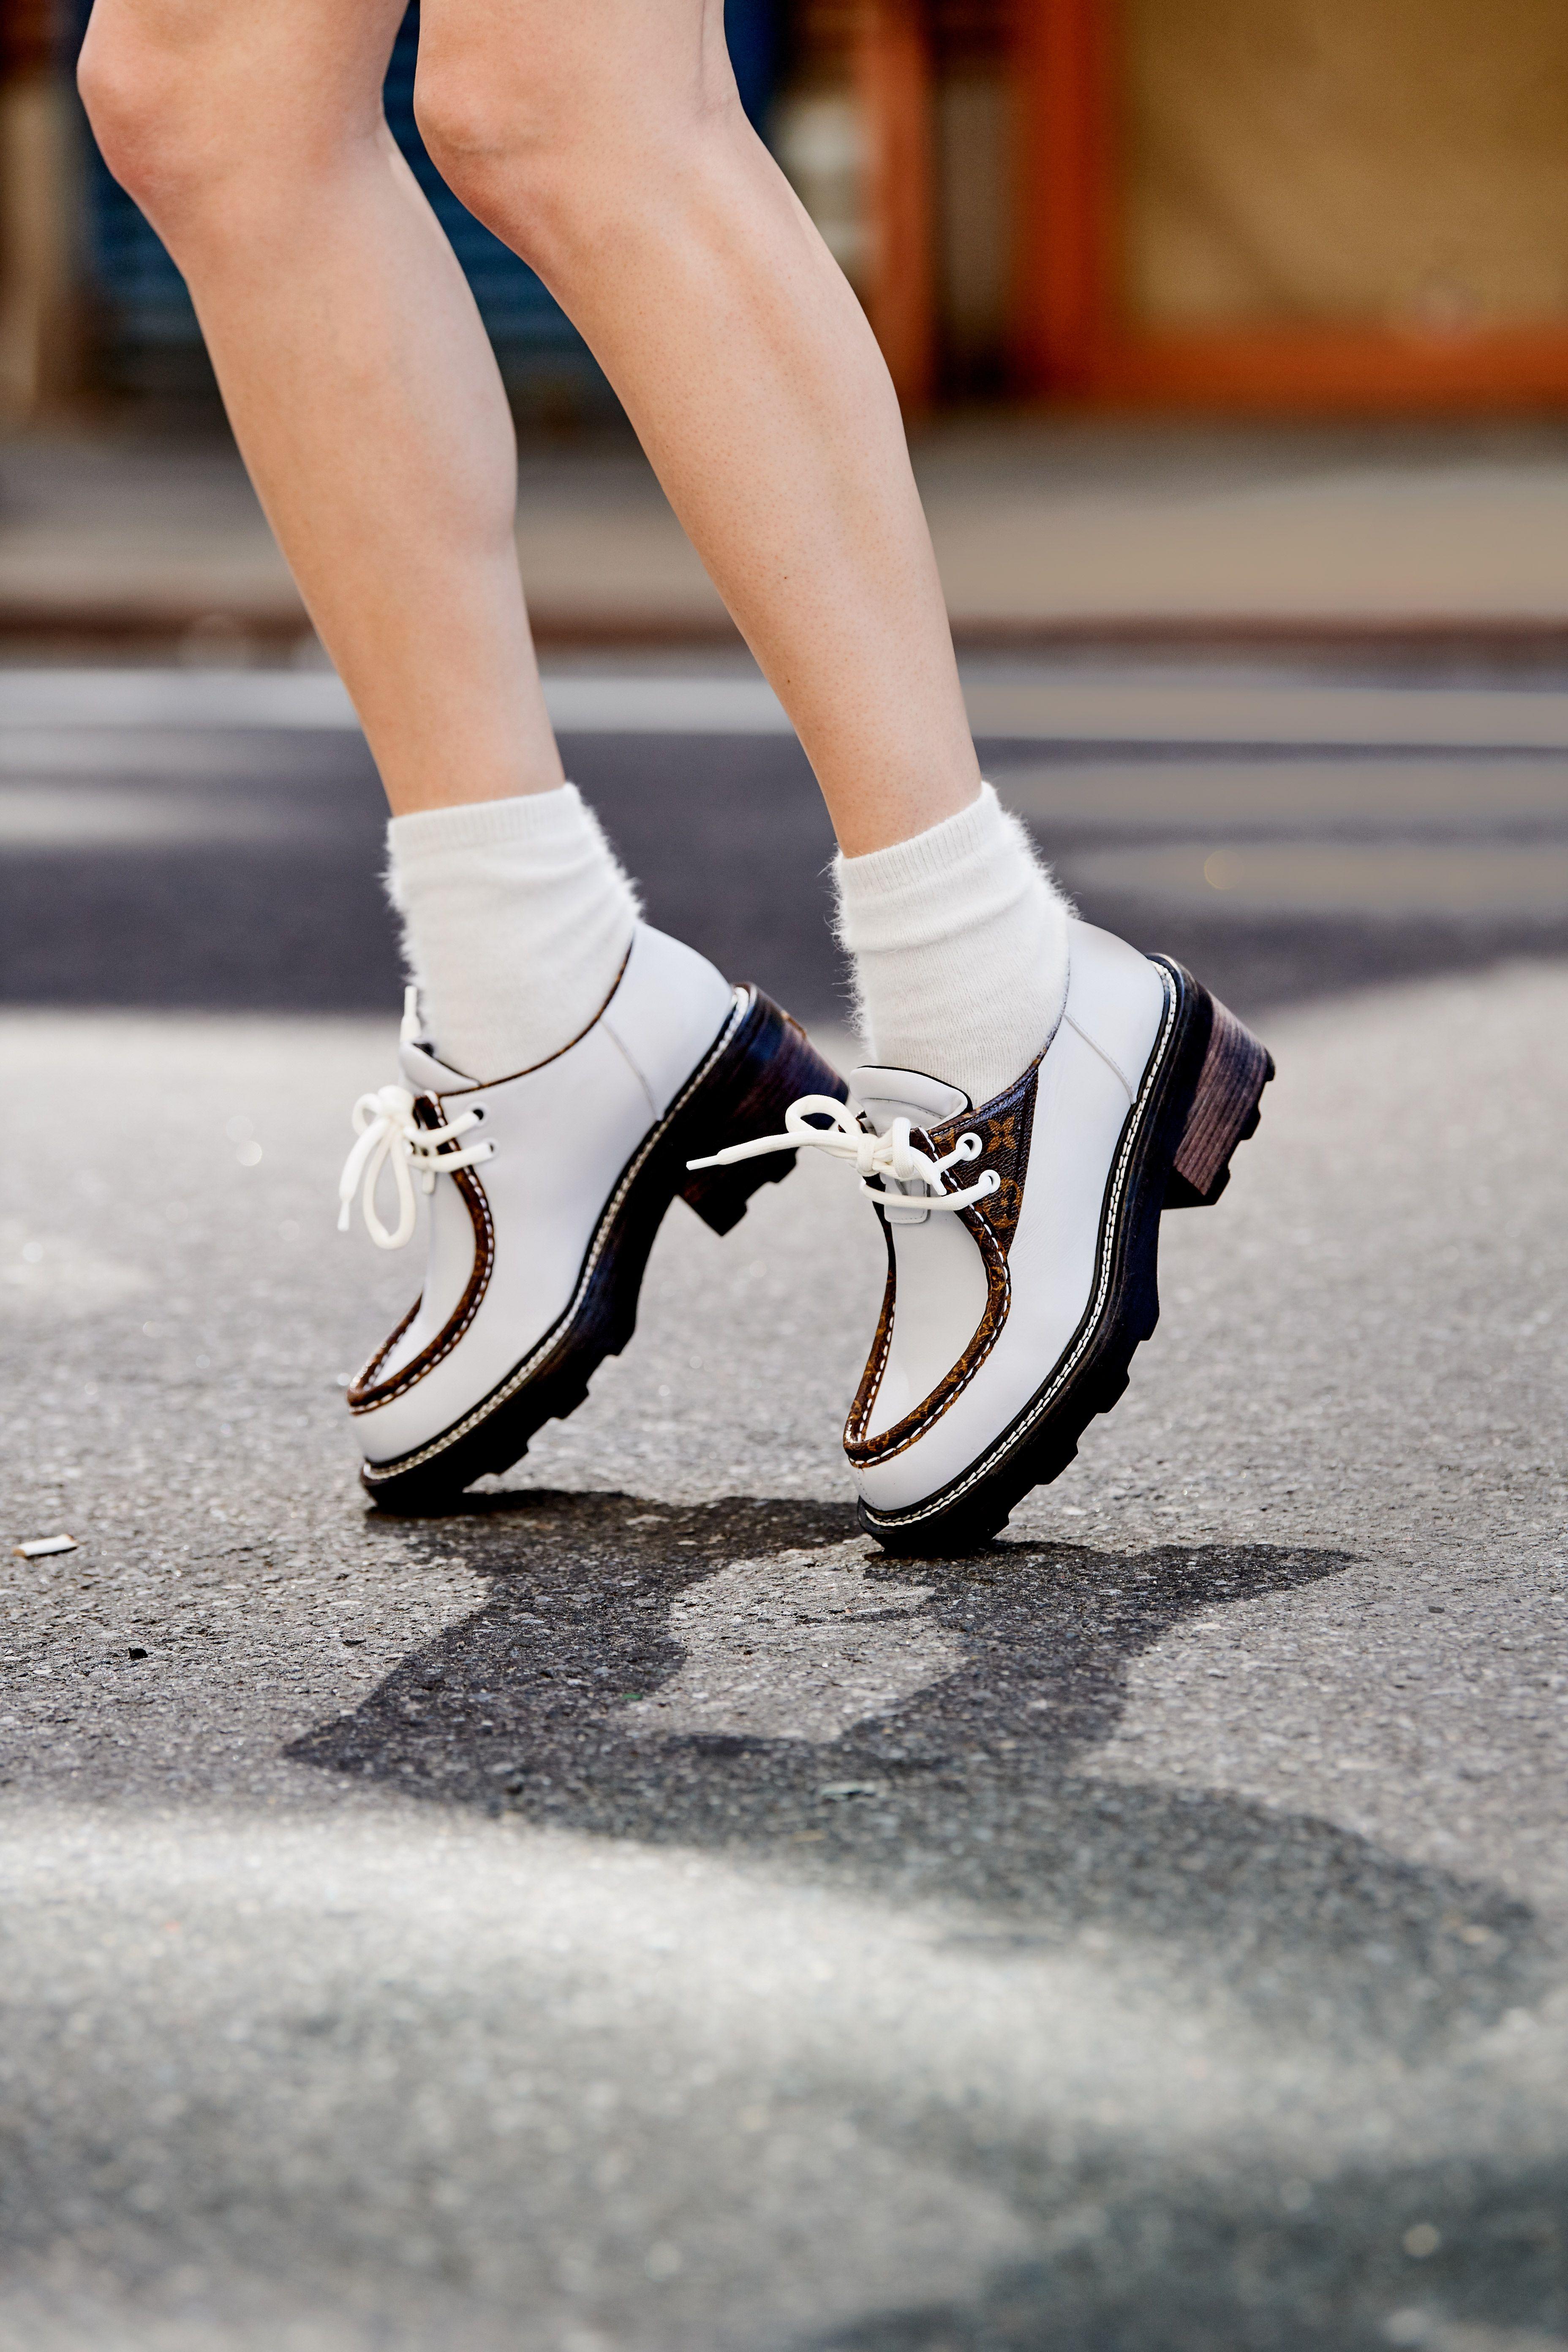 15 Shoe Trends for 2019 - Trending